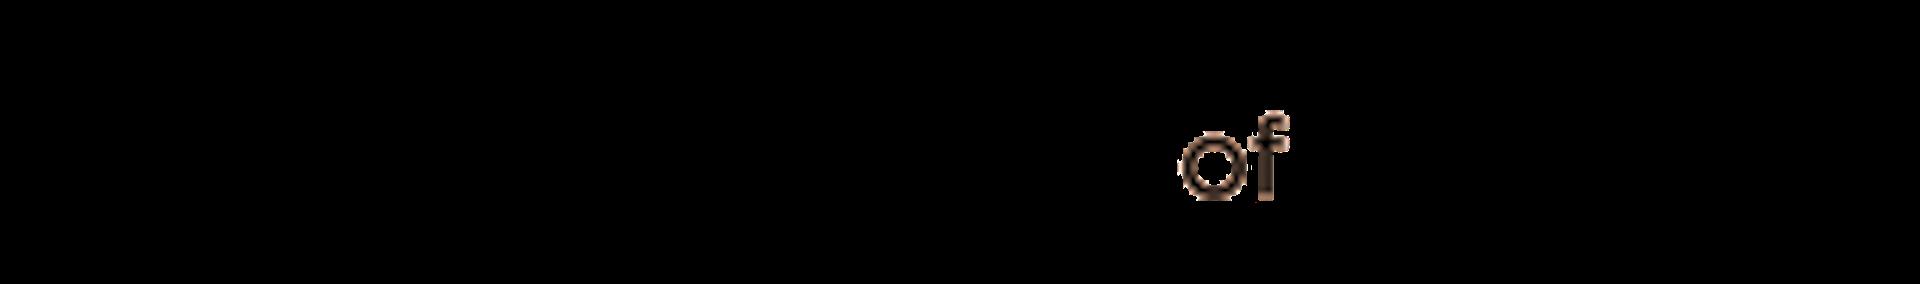 Logo 1396580847.png?ixlib=rb 1.1